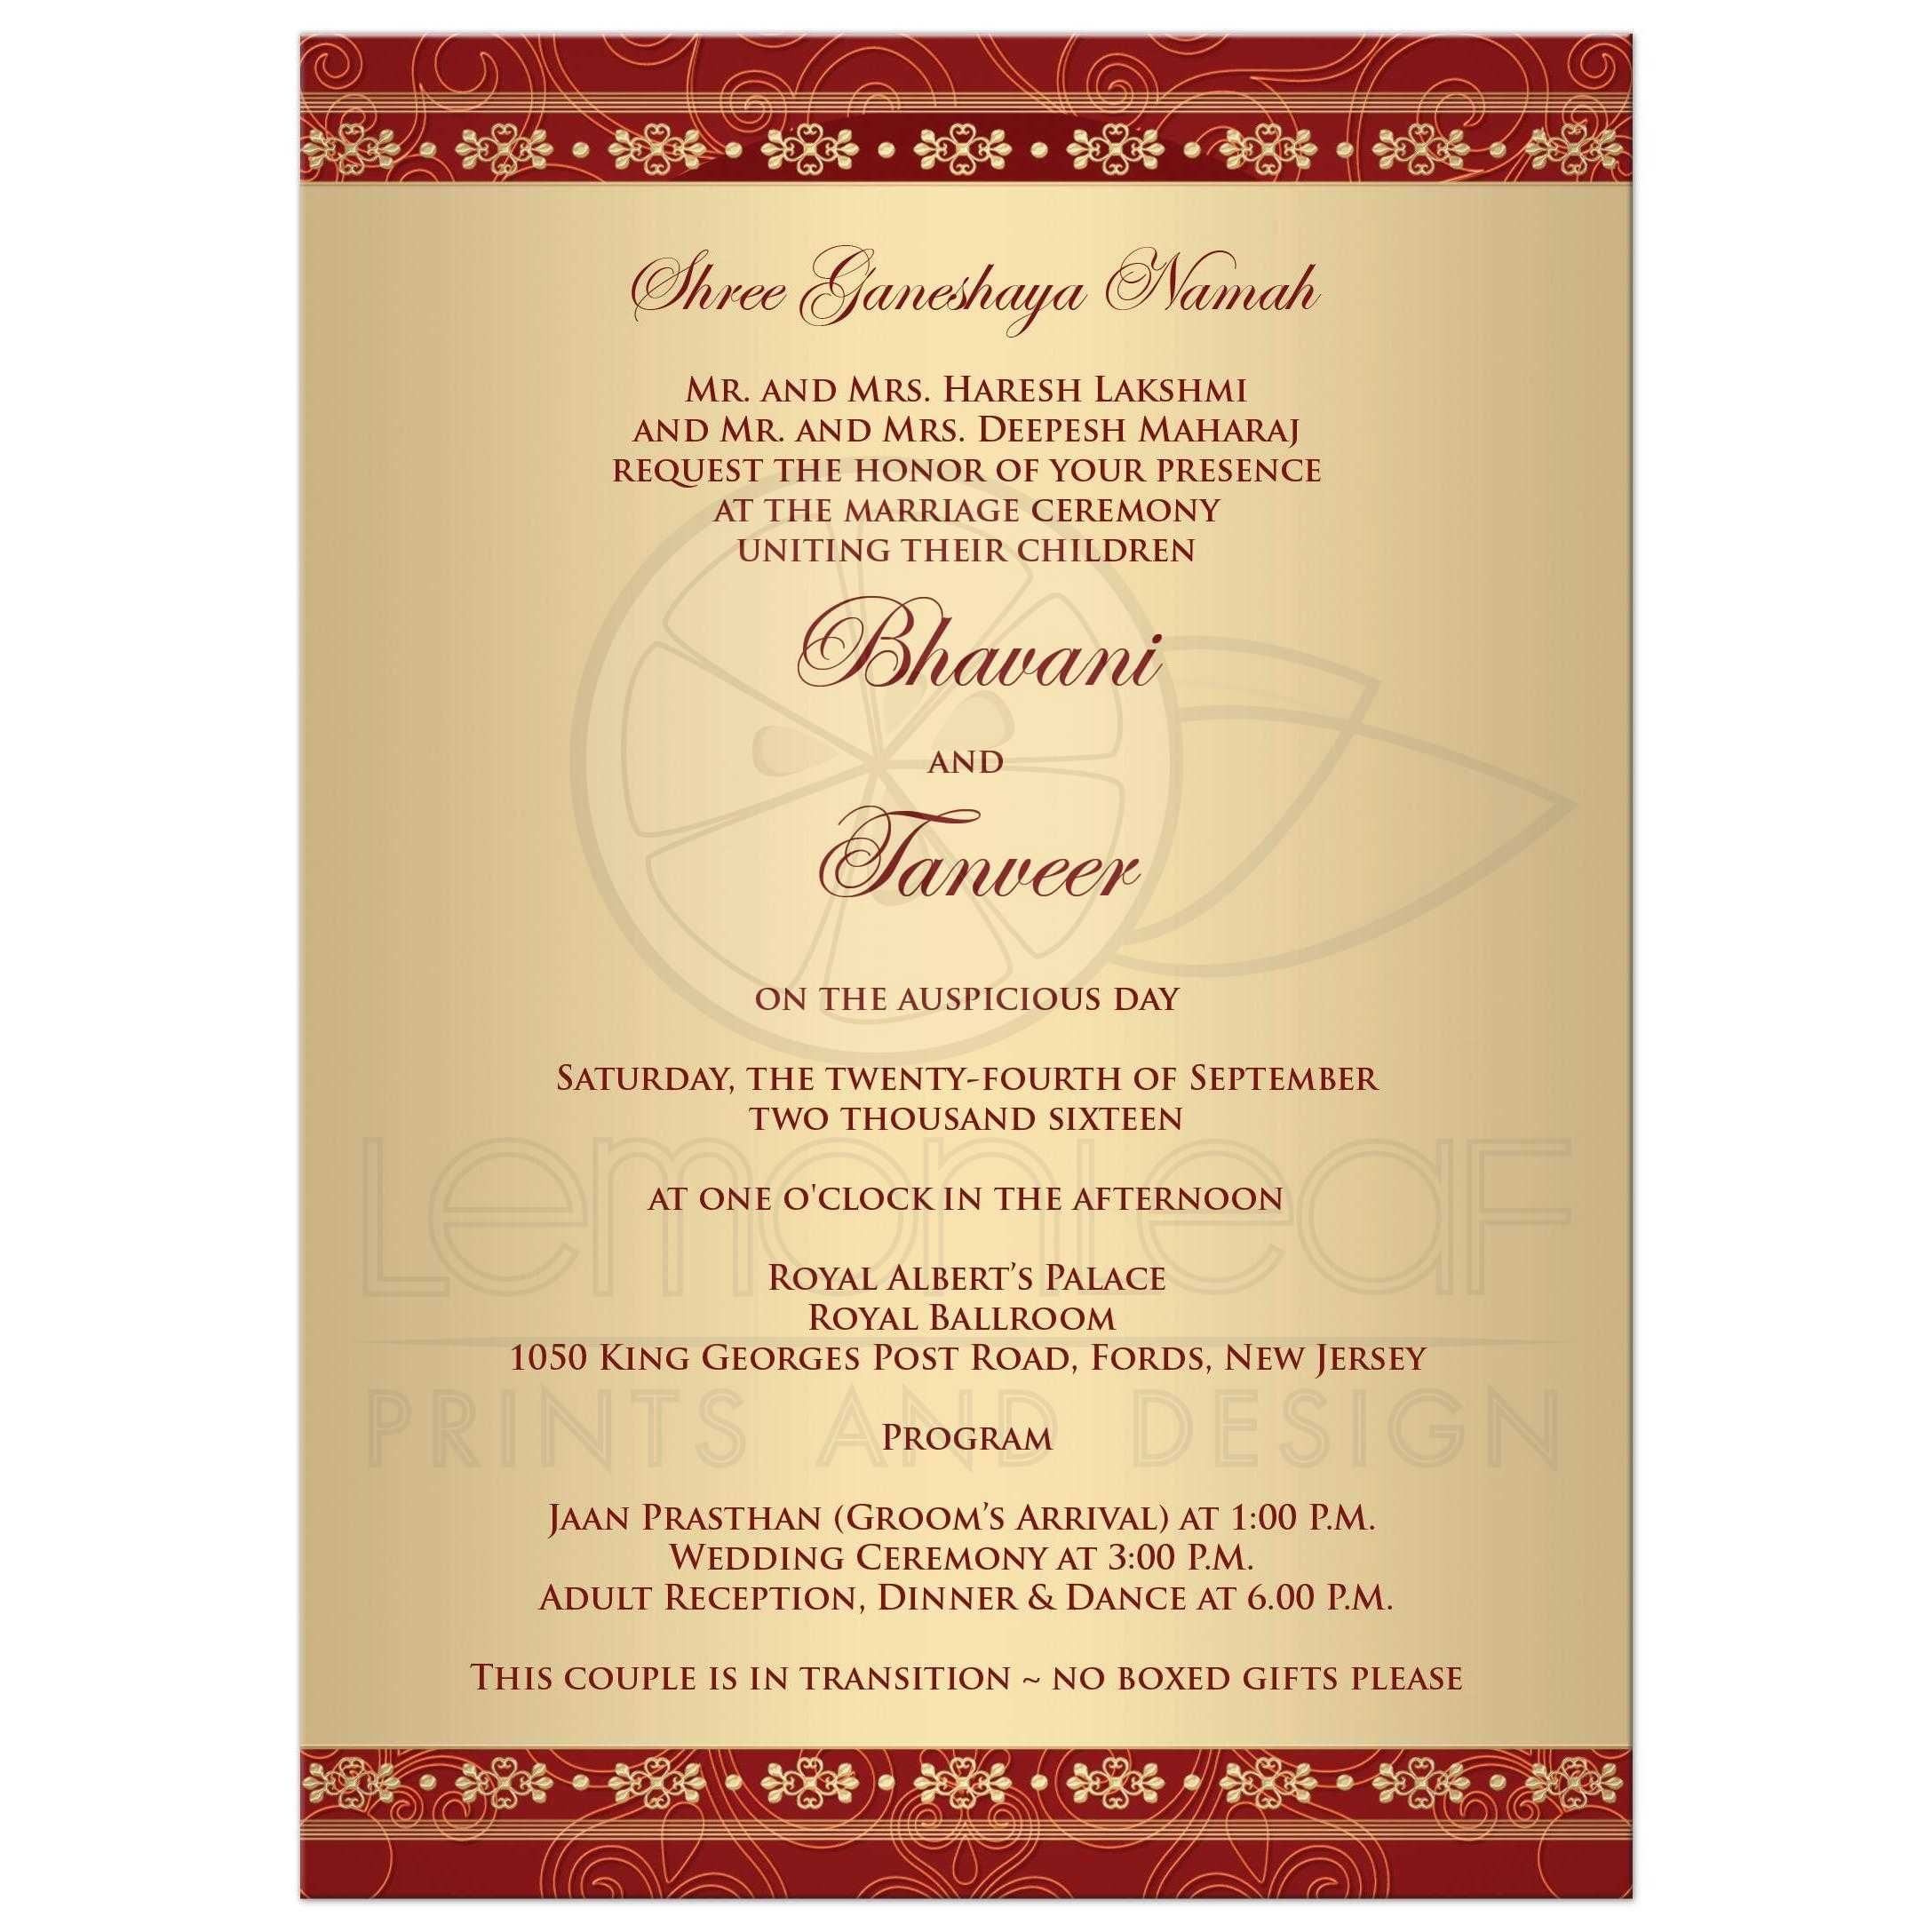 Wedding Invitation | Hindu Ganesh Red, Gold Scrolls, Stars